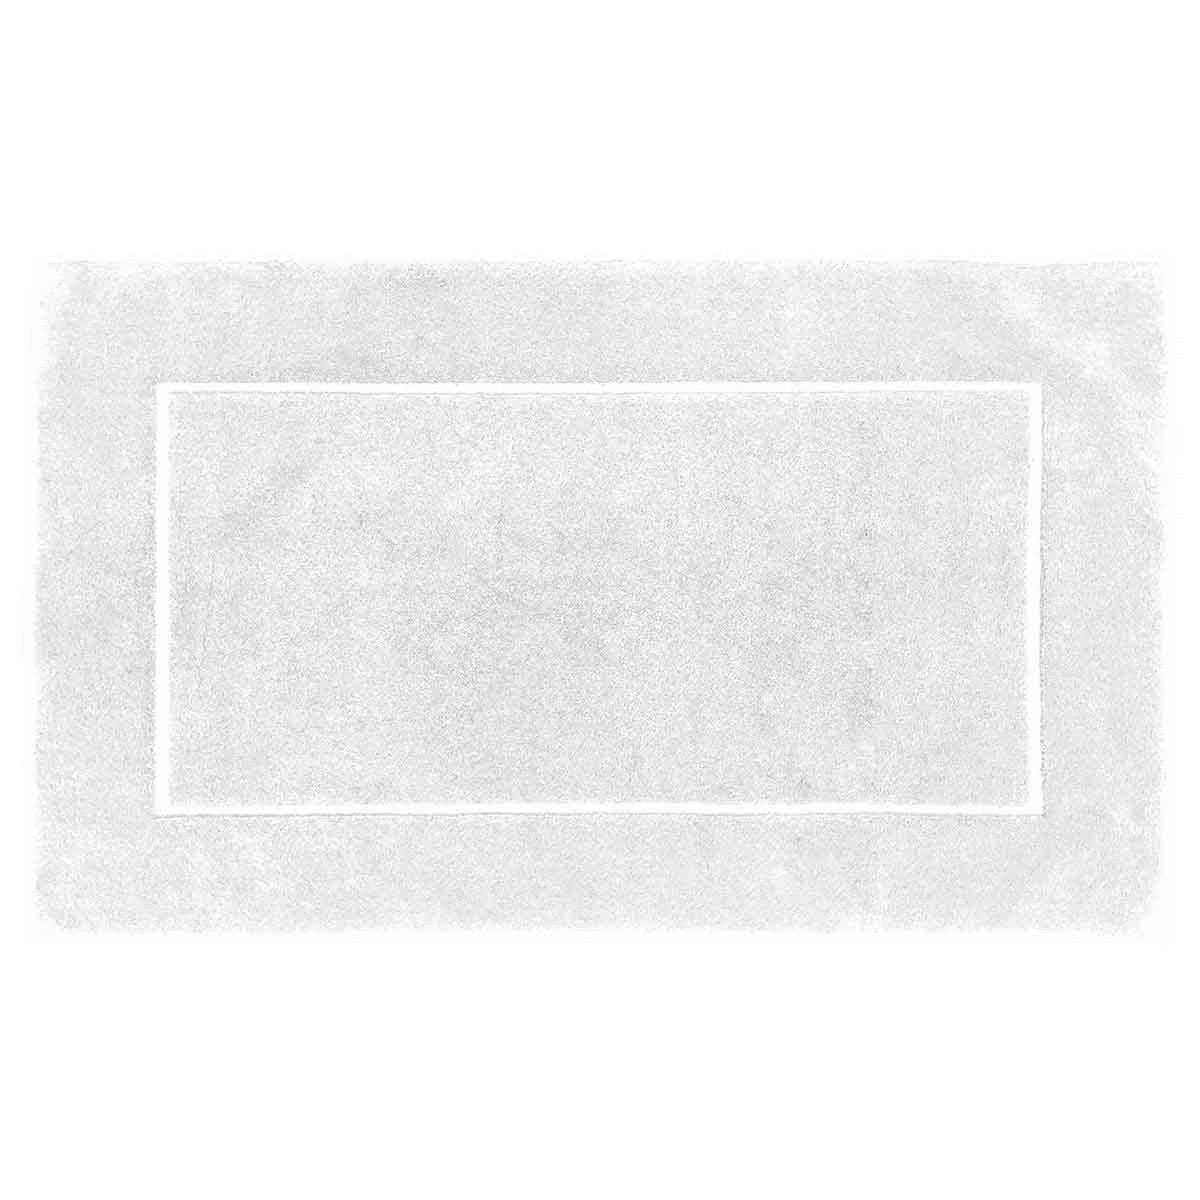 SENSOFT - Tapis de bain 60x100cm 1000gr/m²  Blanc